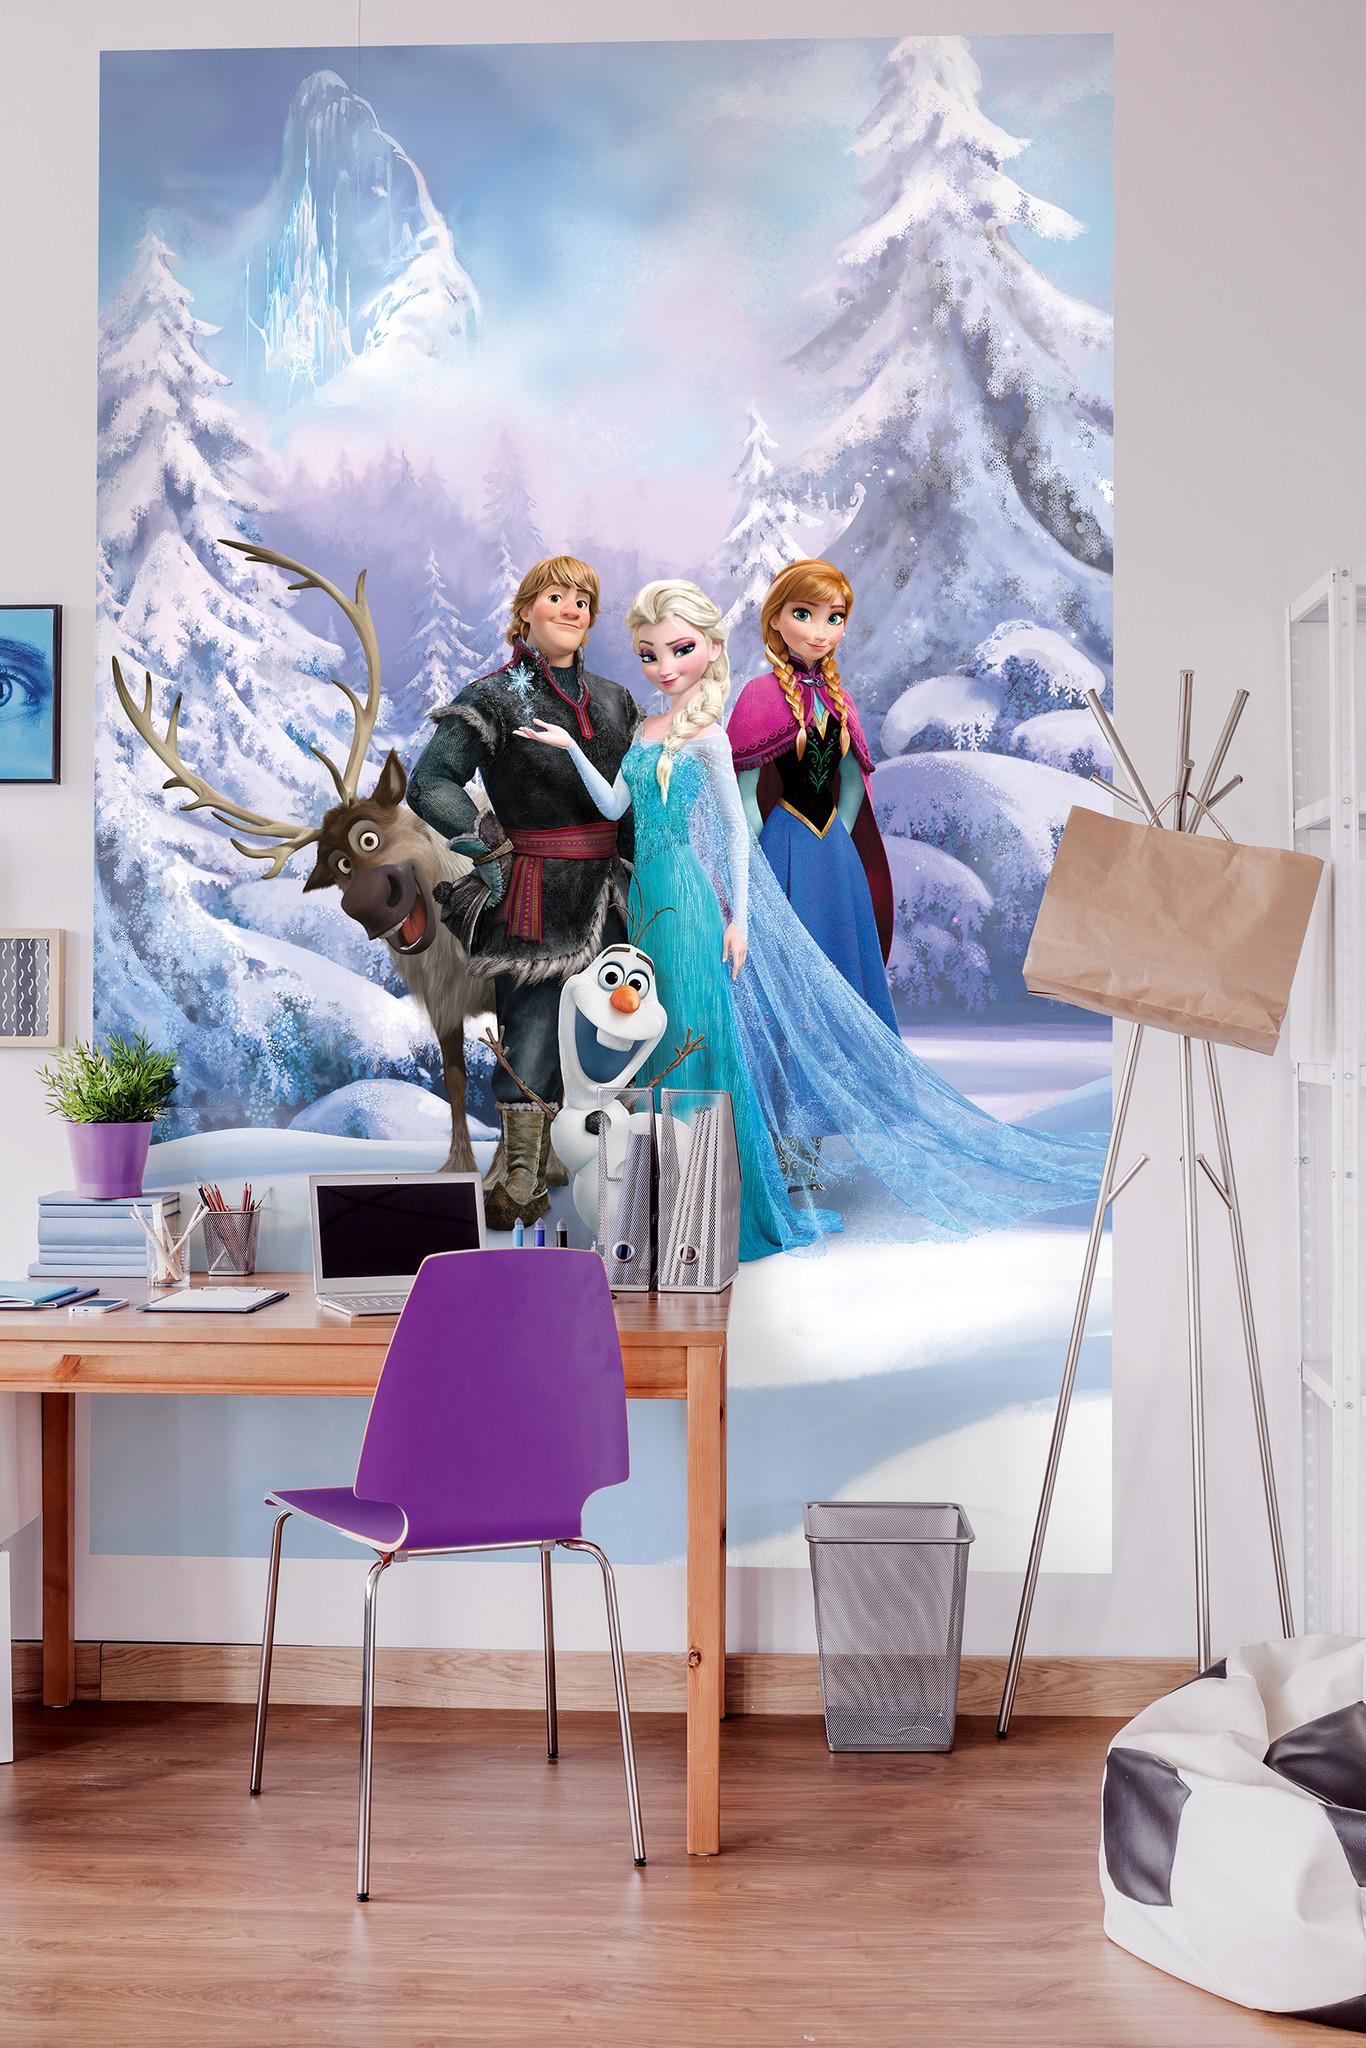 Disney Edition 4 Kinderbehang Komar - Kinderkamer behang FROZEN WINTER LAND